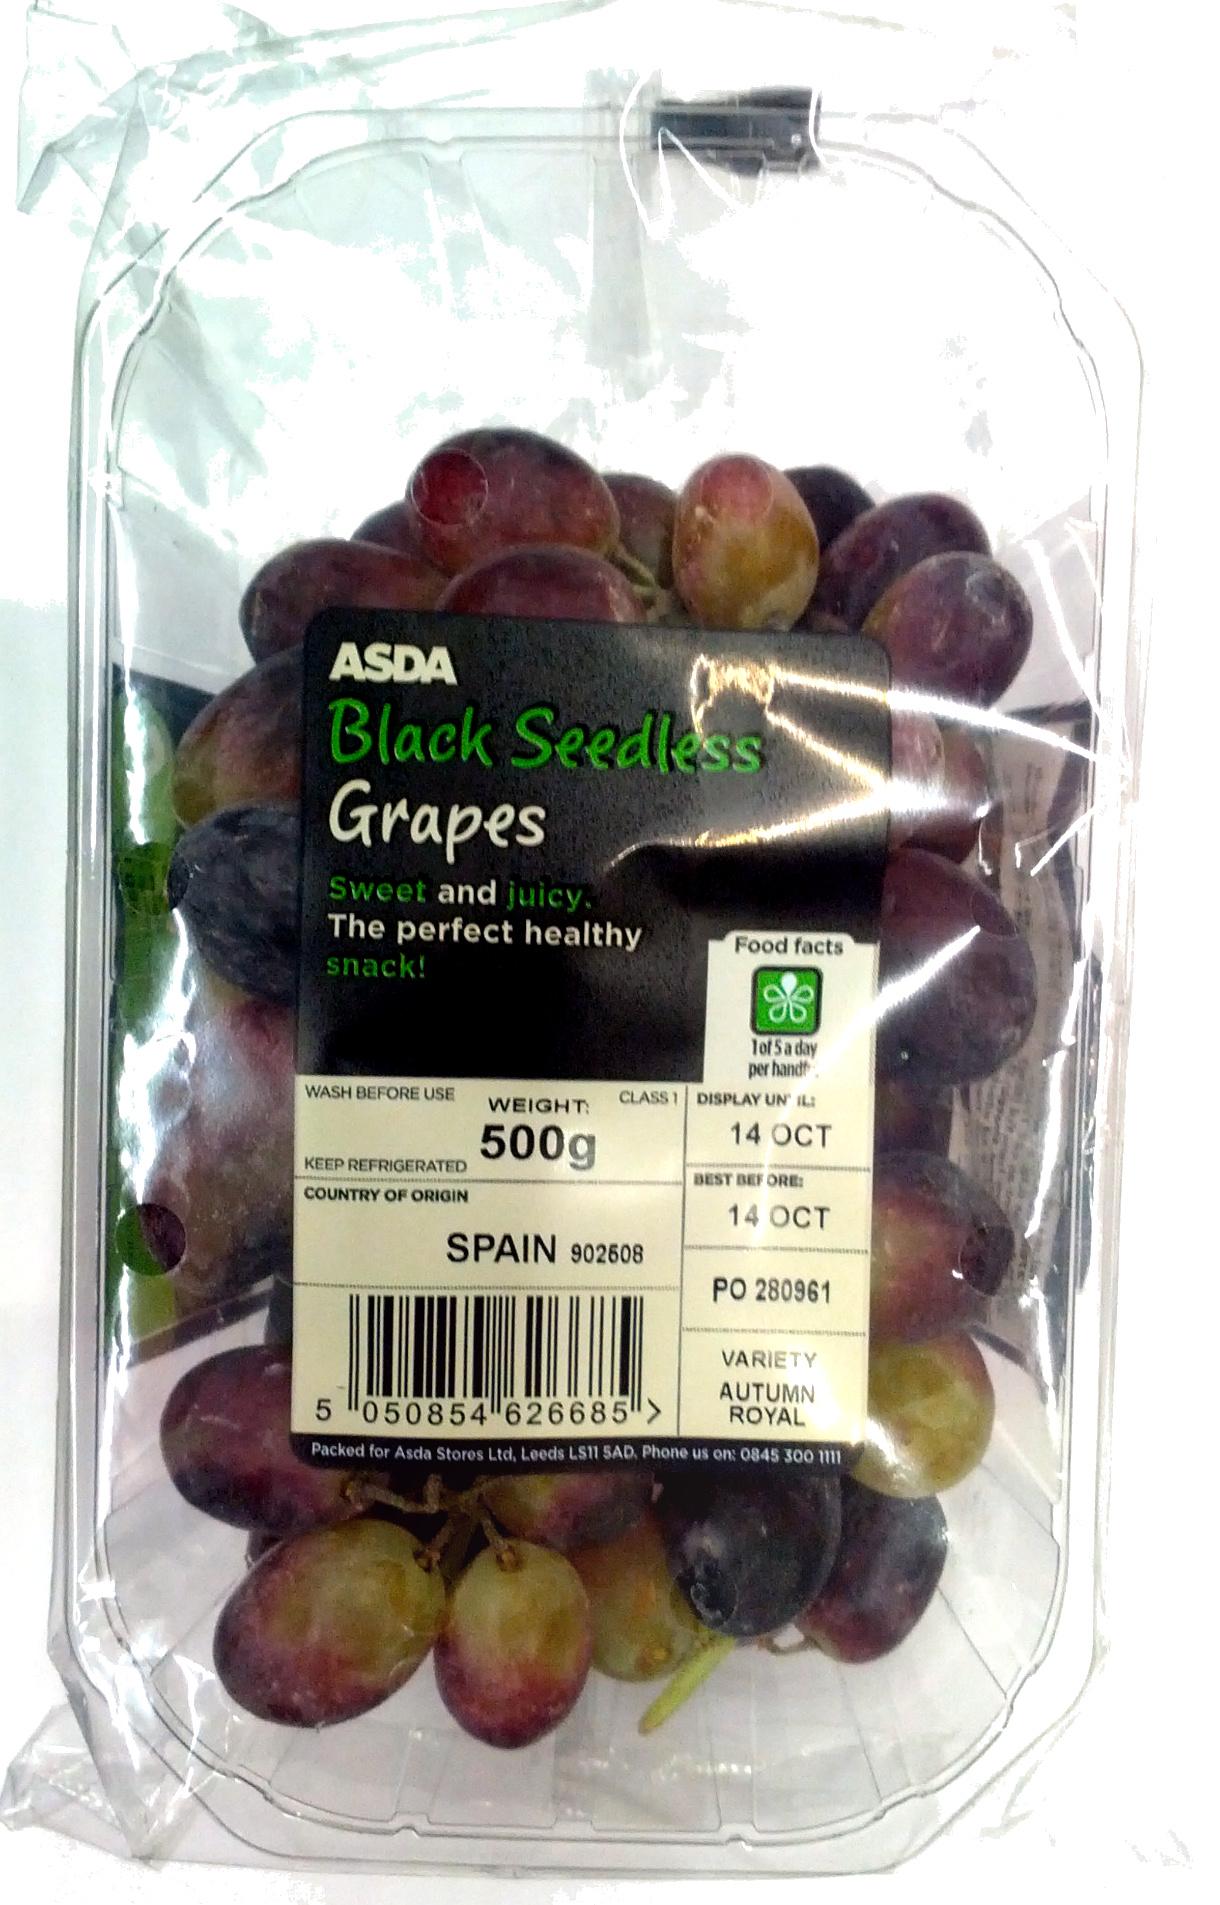 black seedless grapes - asda - 500g